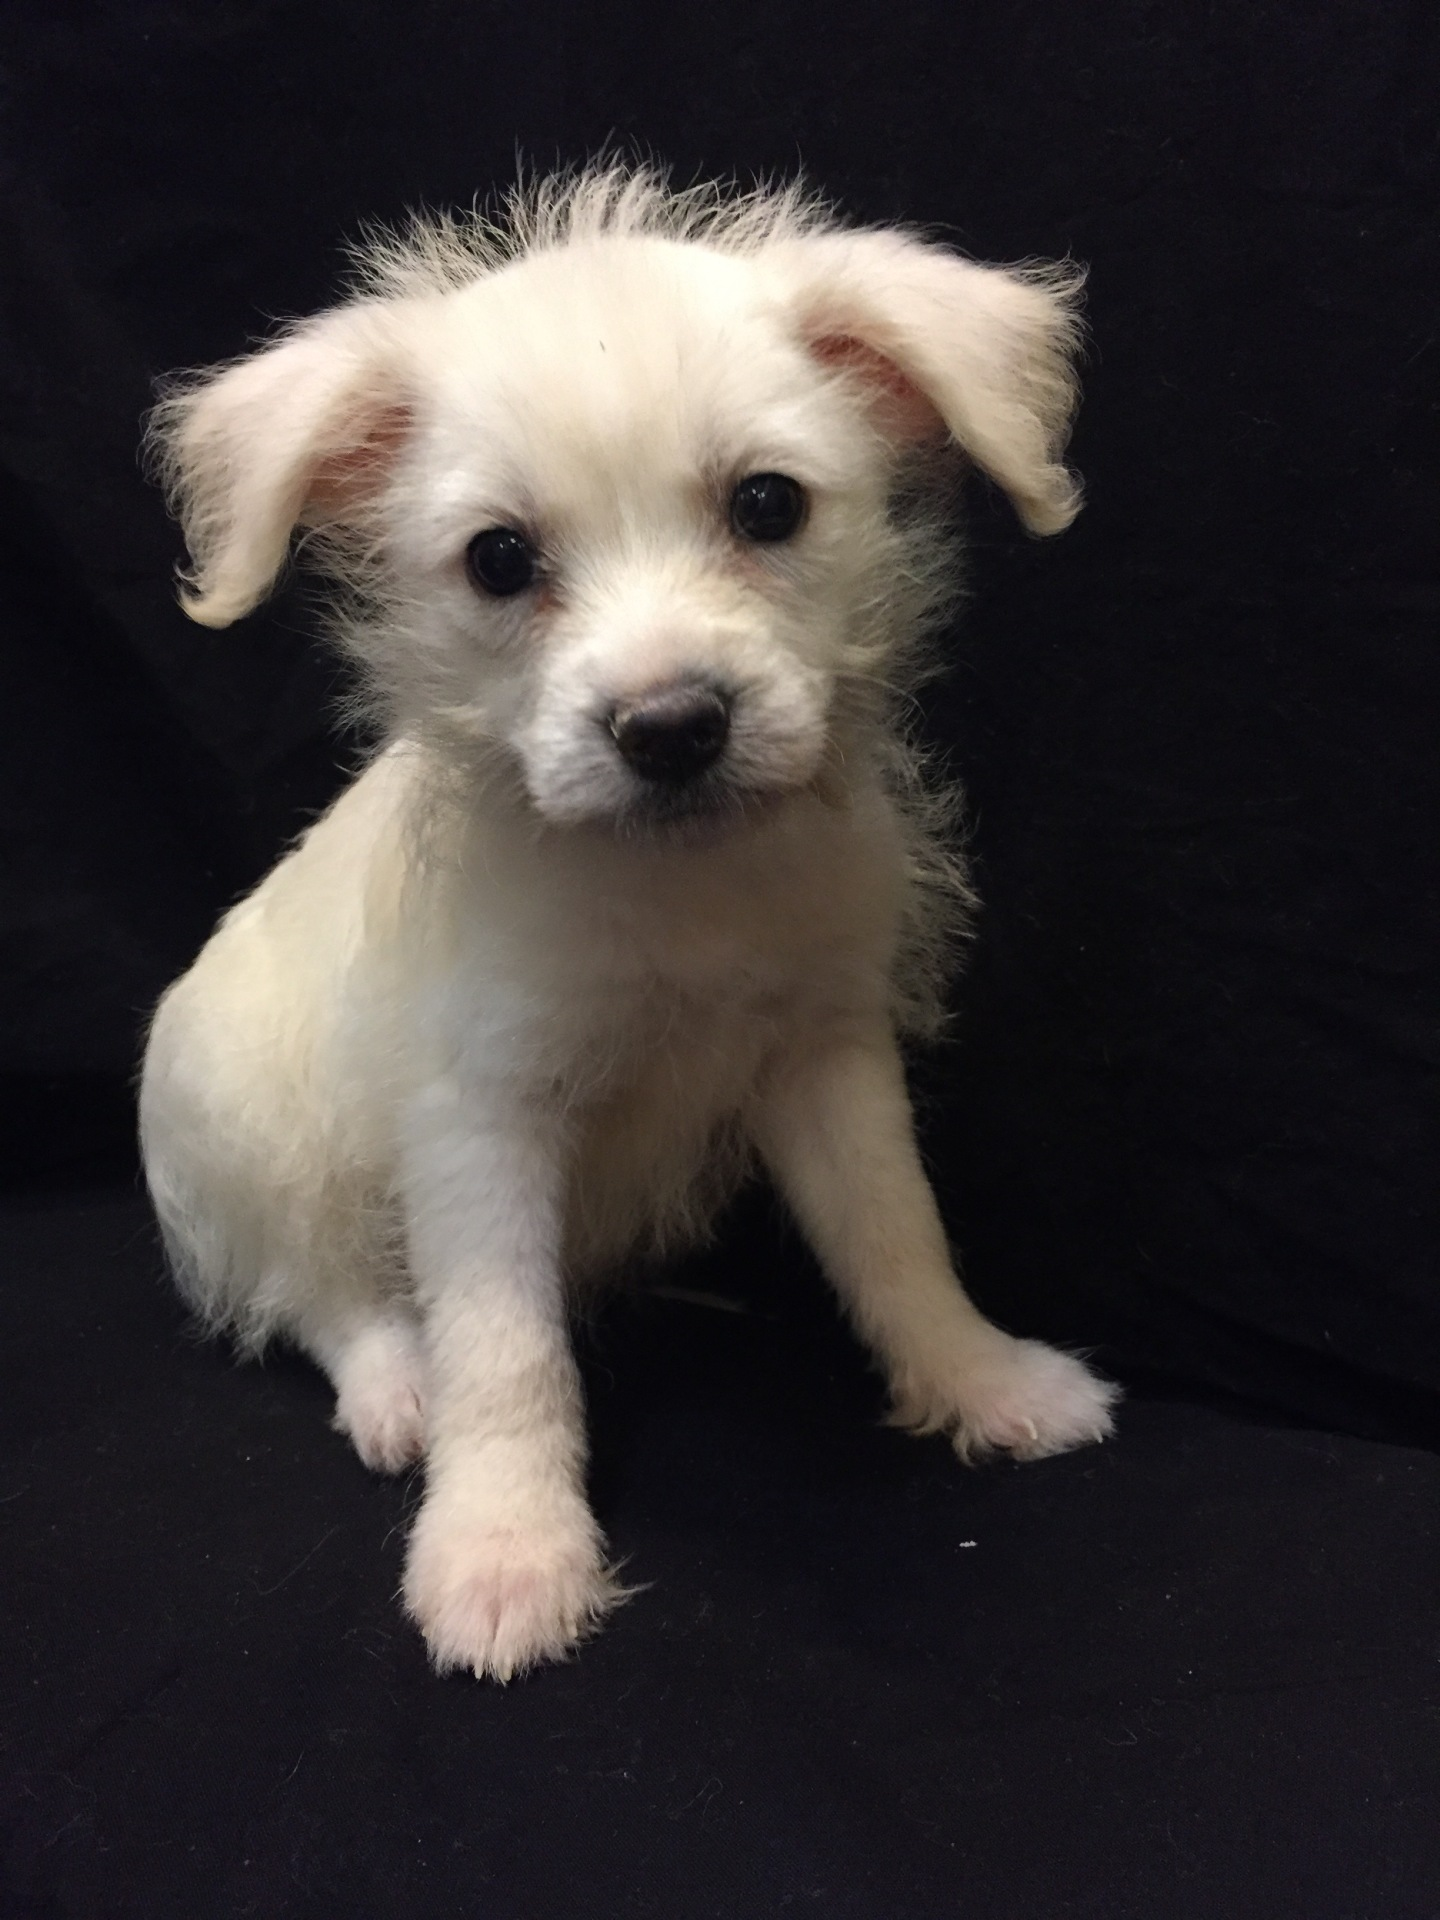 #4758 - Female Chi-Poo (Chihuahua/Poodle)